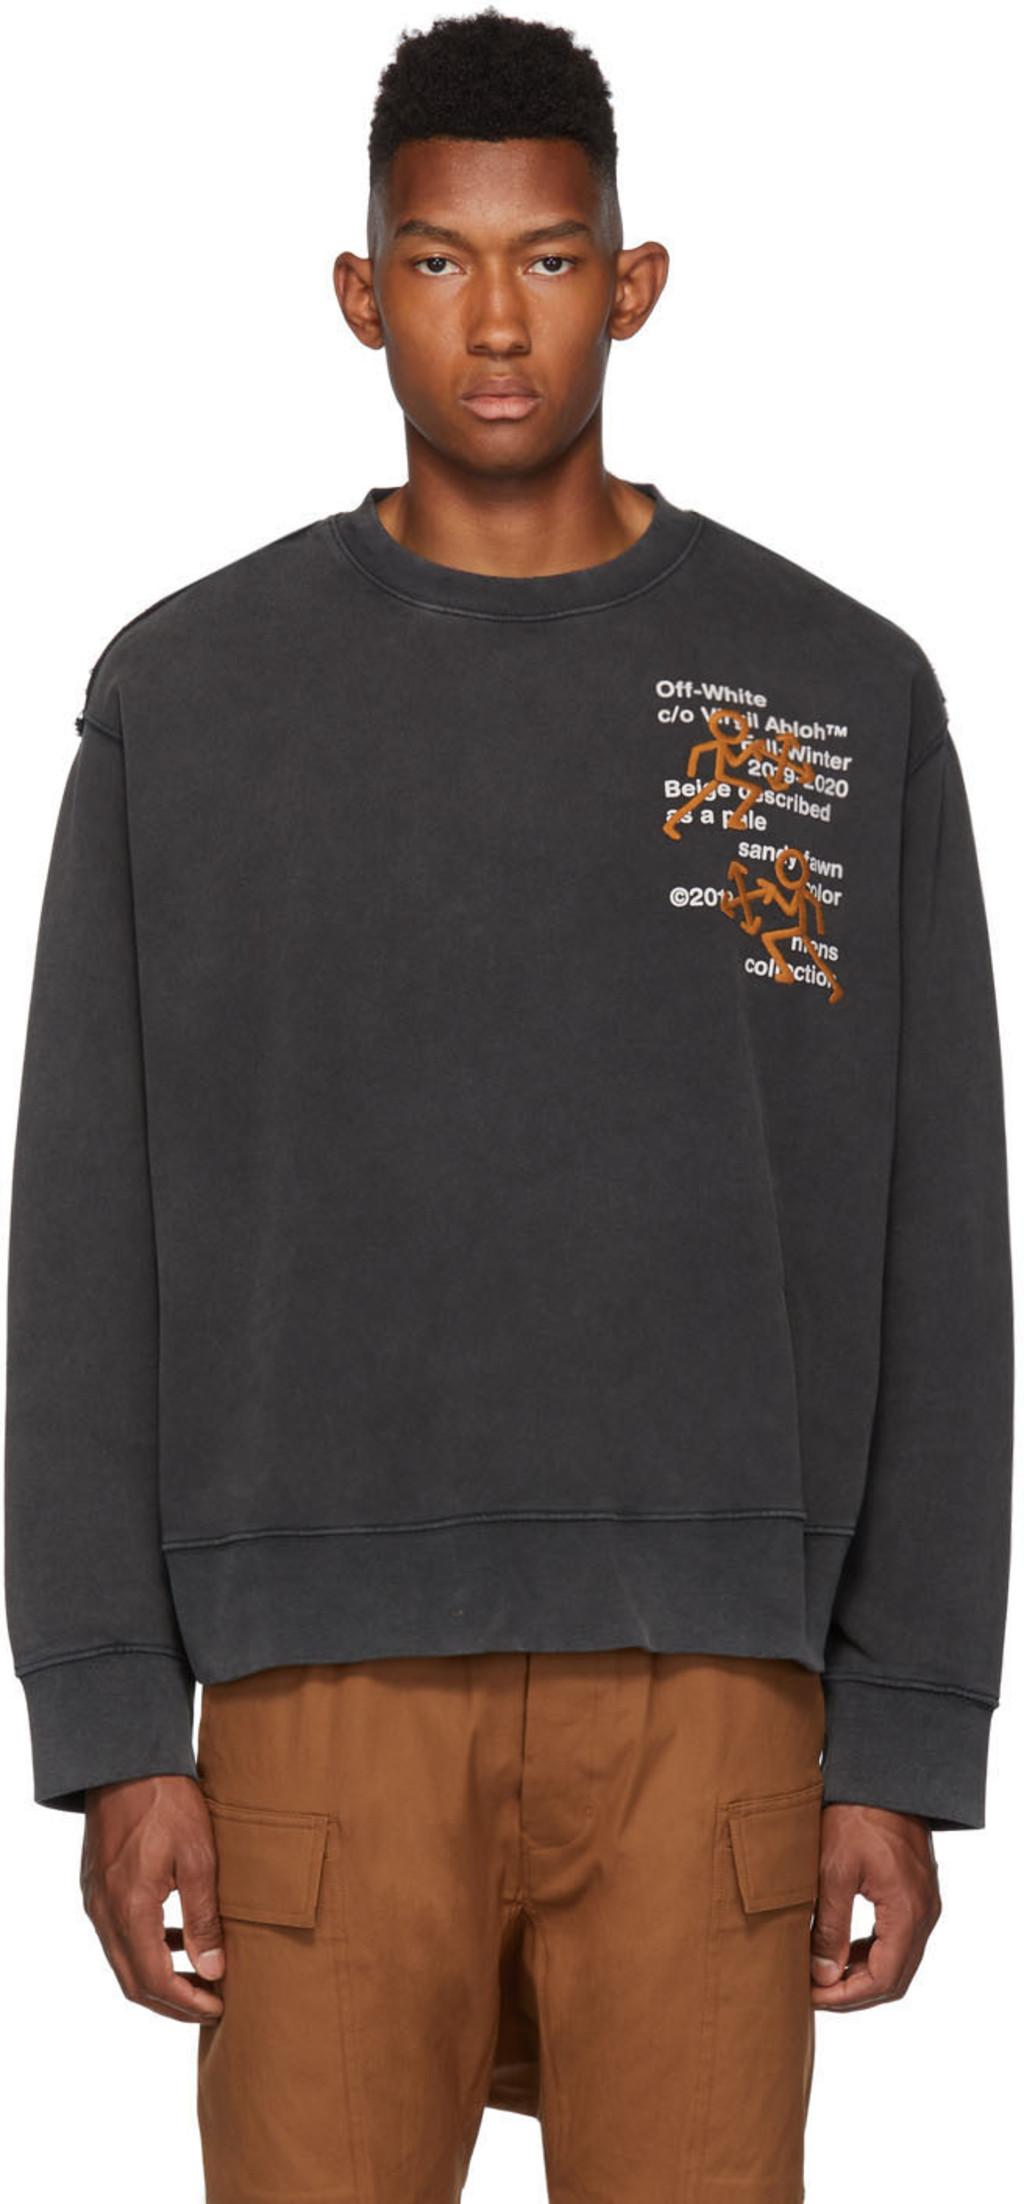 Pictogram Black Sweatshirt Black Pictogram Sweatshirt Incompiuto Incompiuto Black BWdoerCx